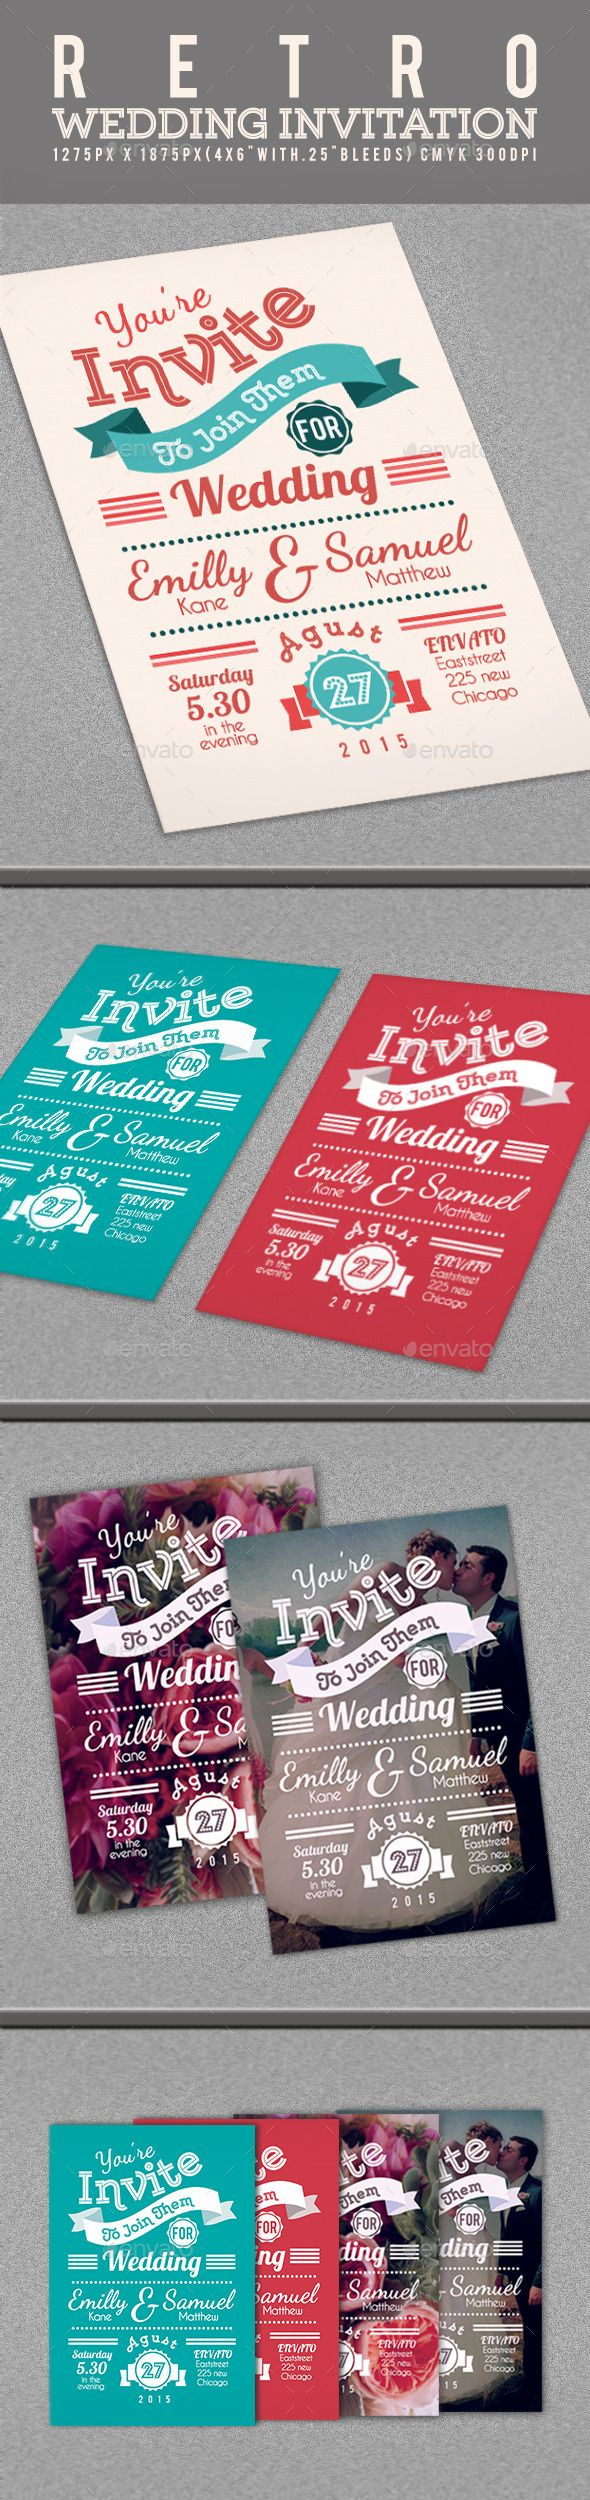 Retro Wedding Invitation Template #design Download: http://graphicriver.net/item/retro-wedding-invitation/12445667?ref=ksioks